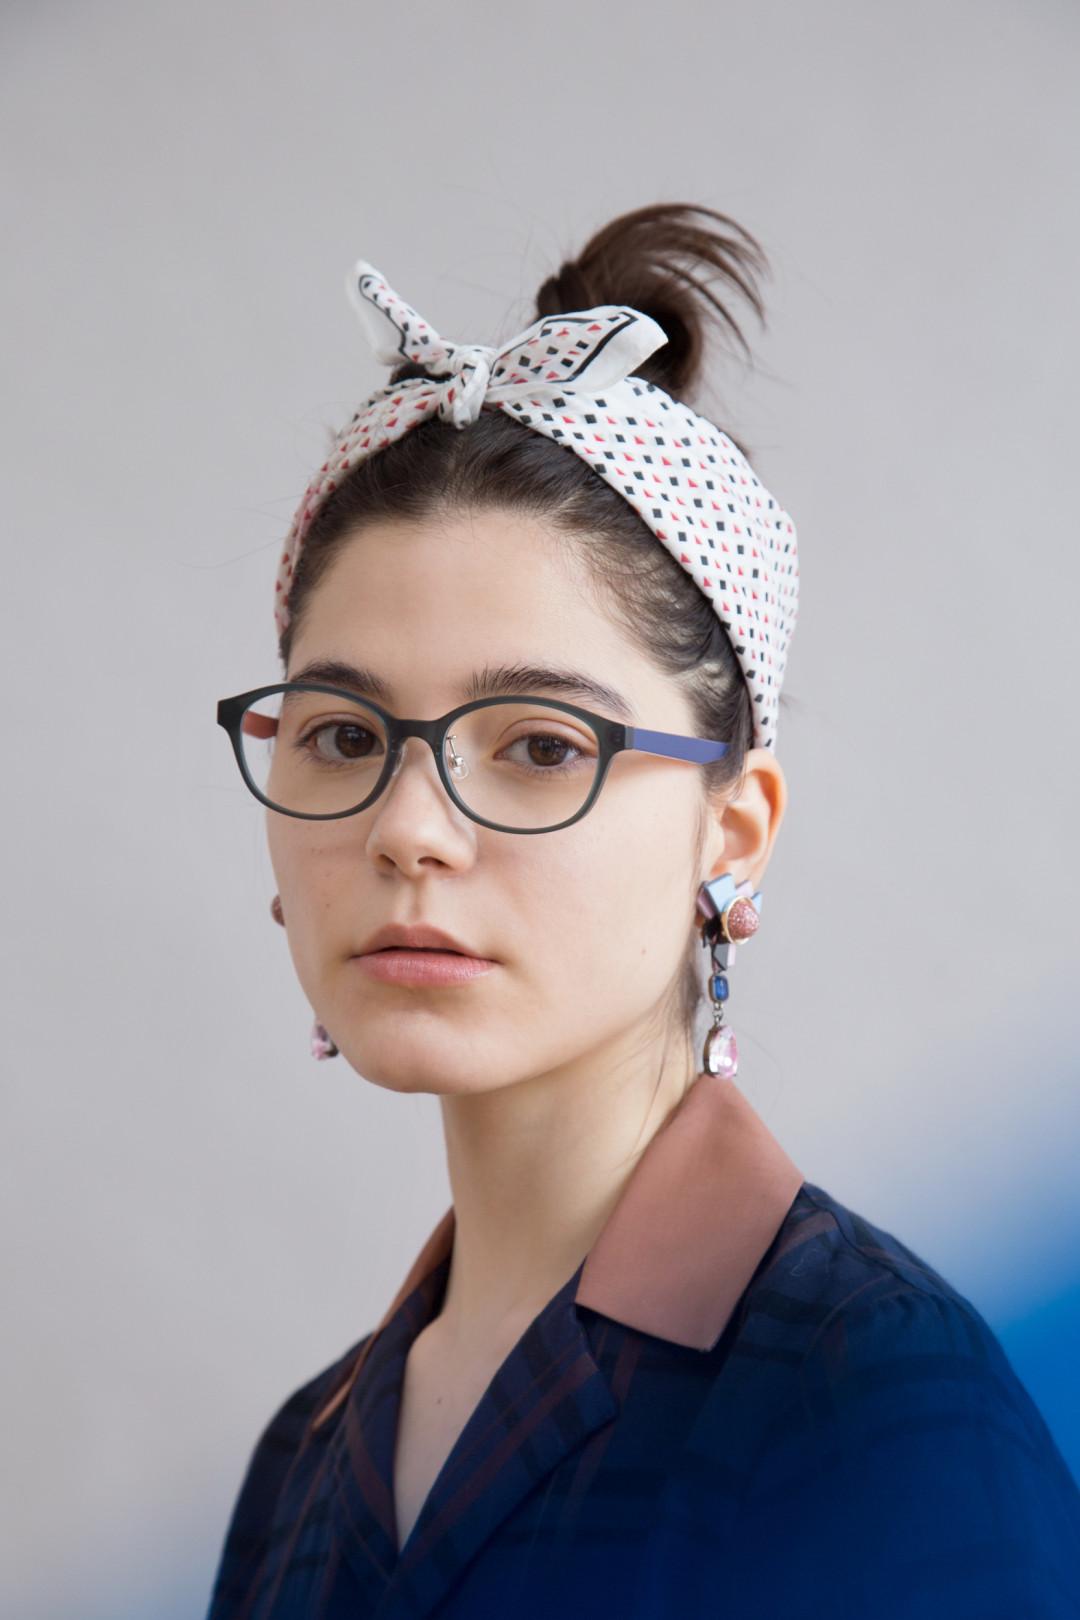 JINS X Papier Tigre |當日系平價眼鏡遇上巴黎人氣文具店